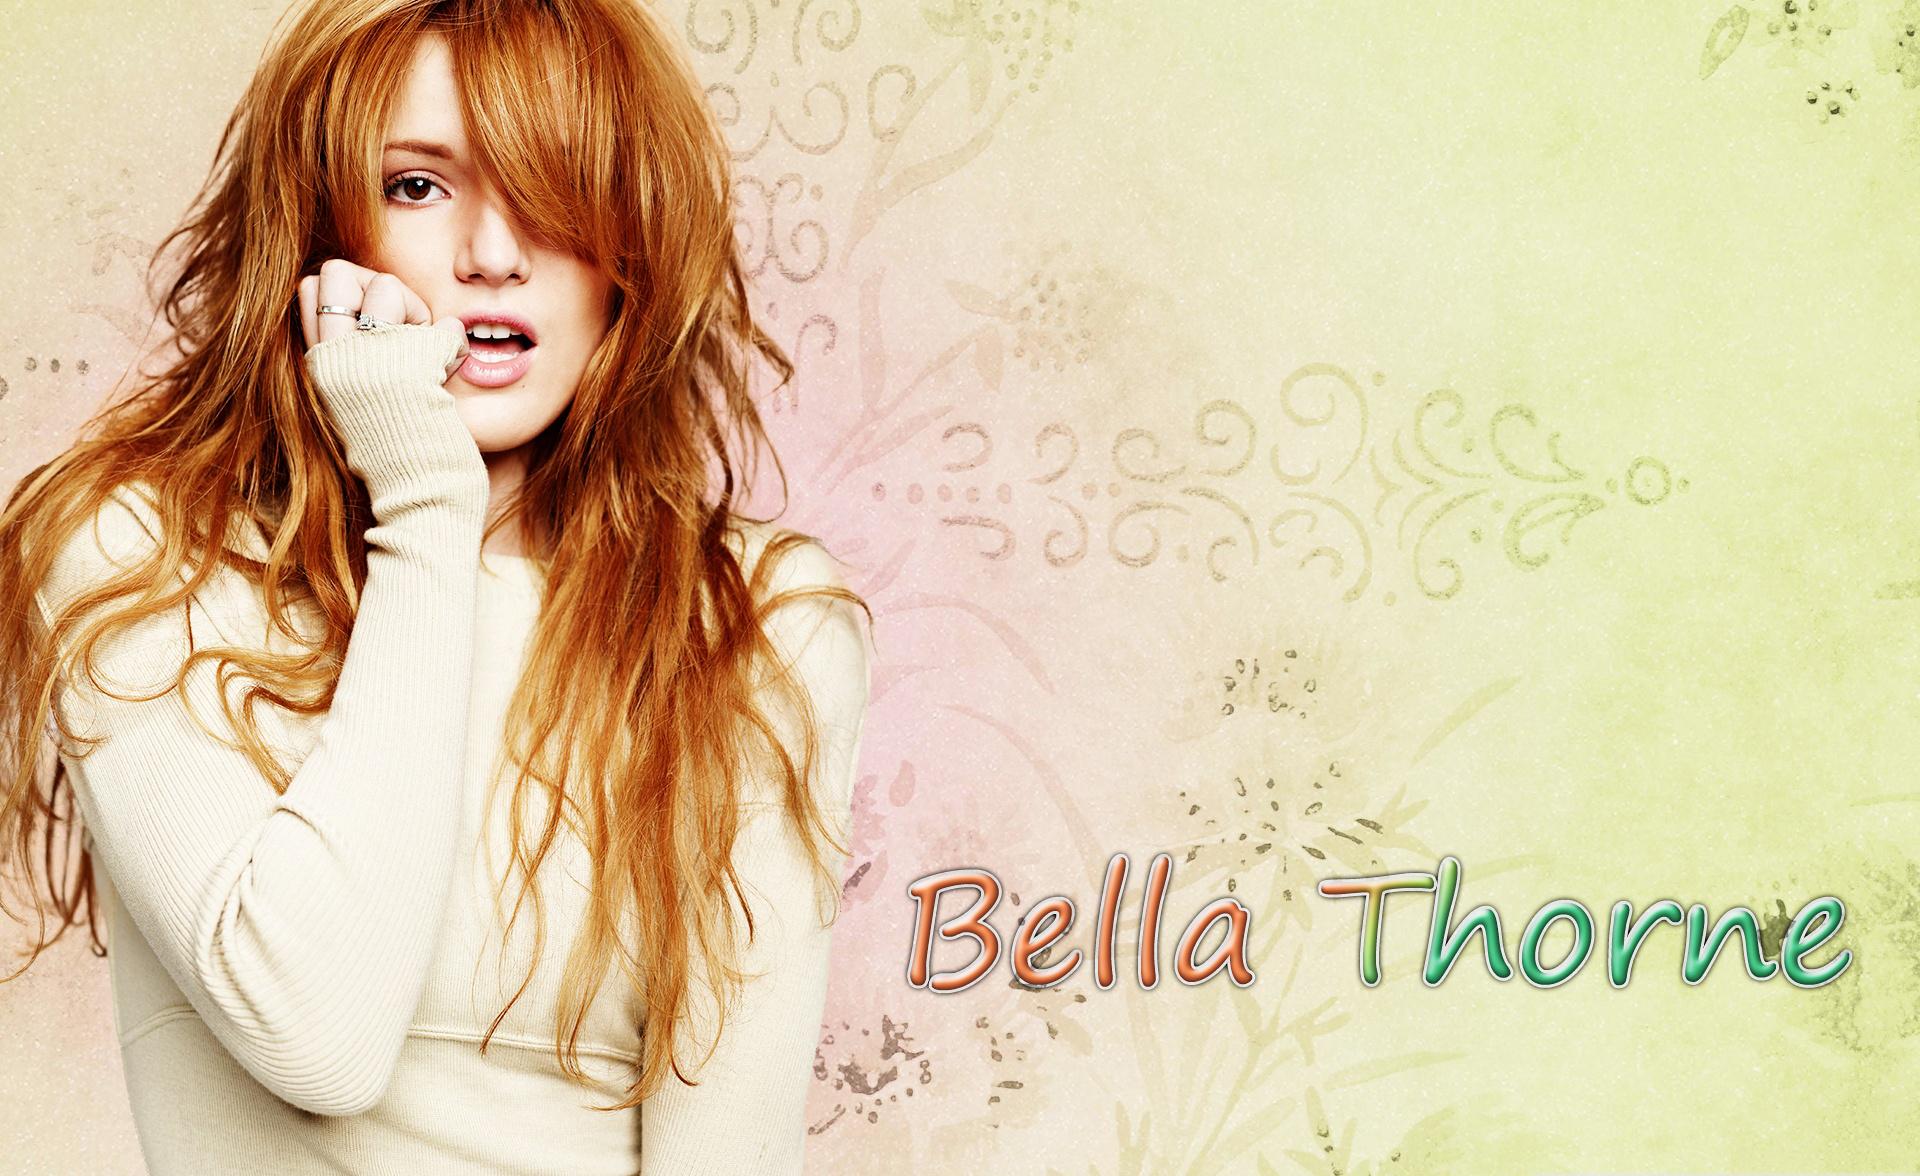 bella thorne wallpaper by - photo #28